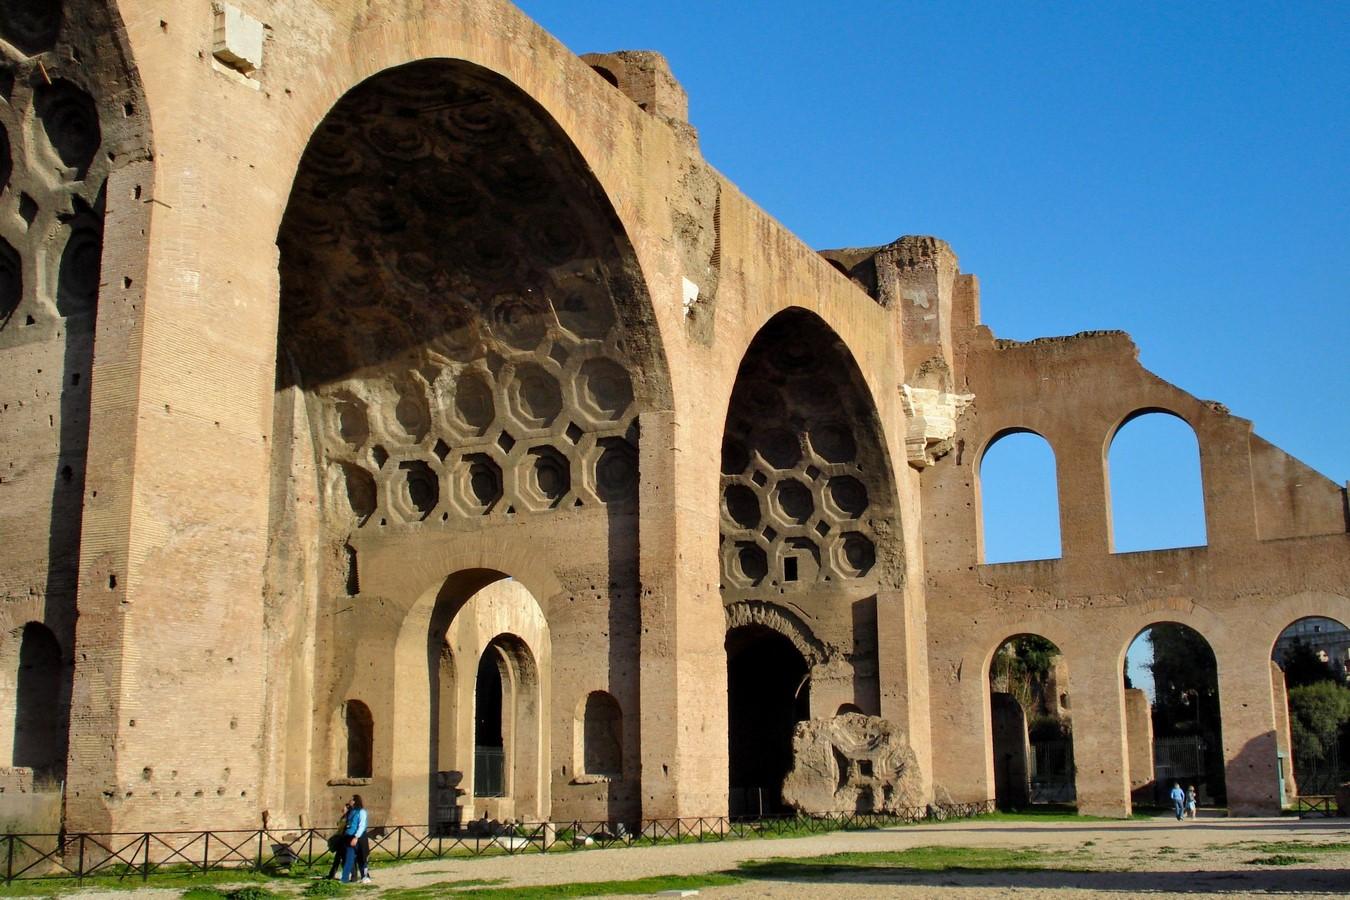 The basilica Maxentius